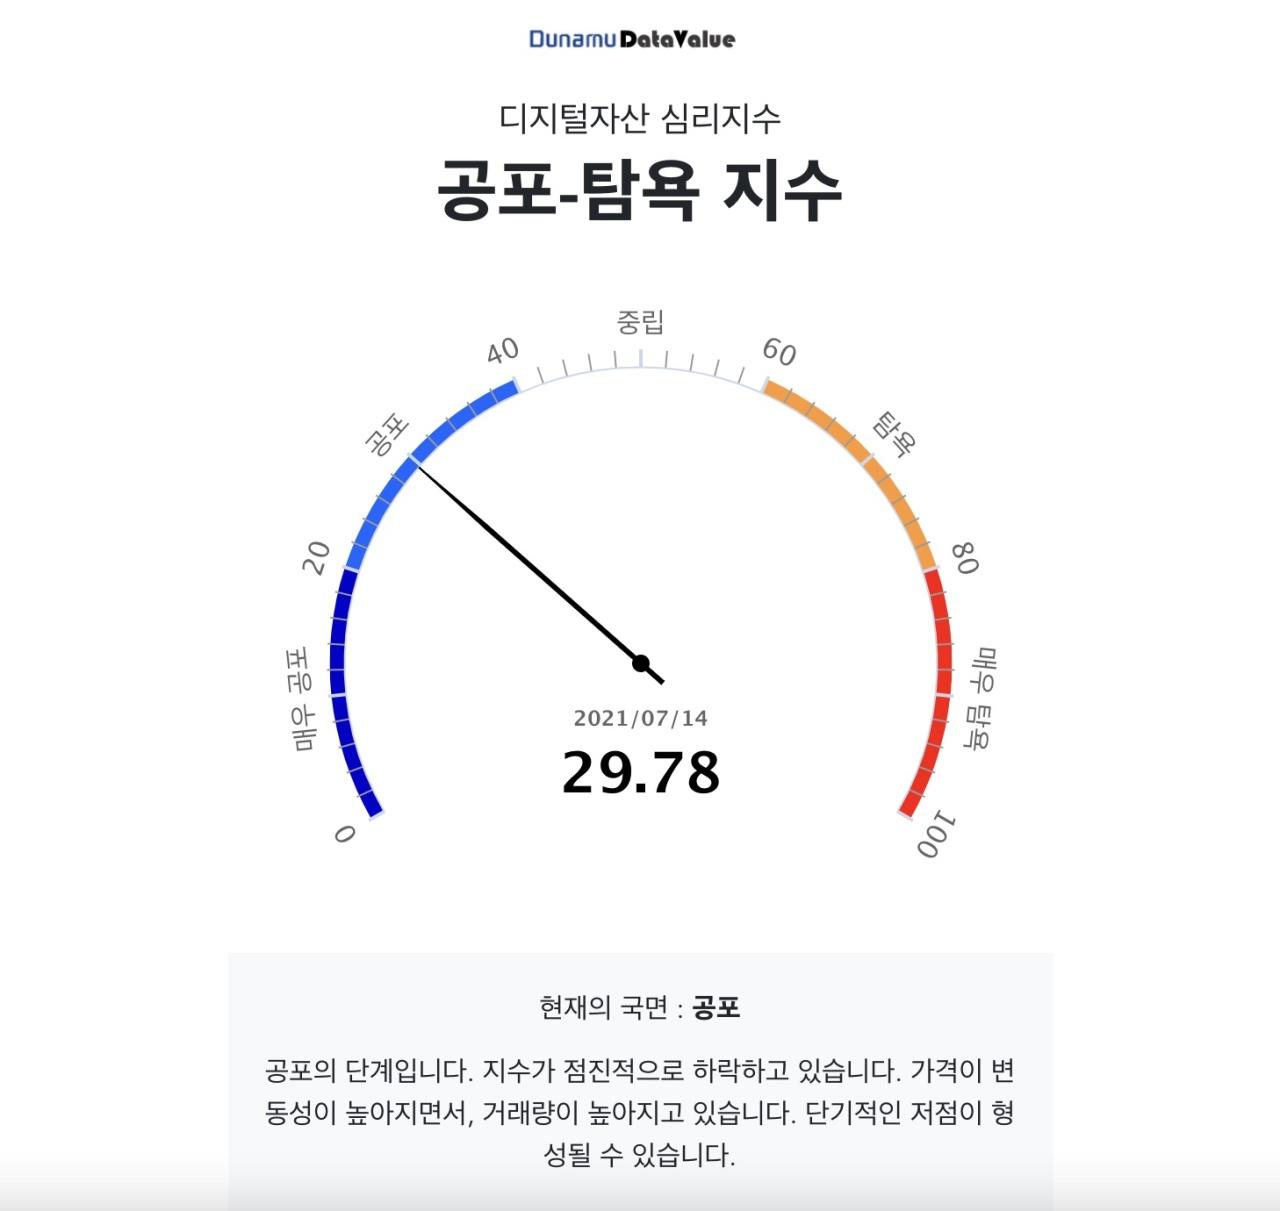 Dunamu's Digital Asset Fear and Greed Index (Dunamu)